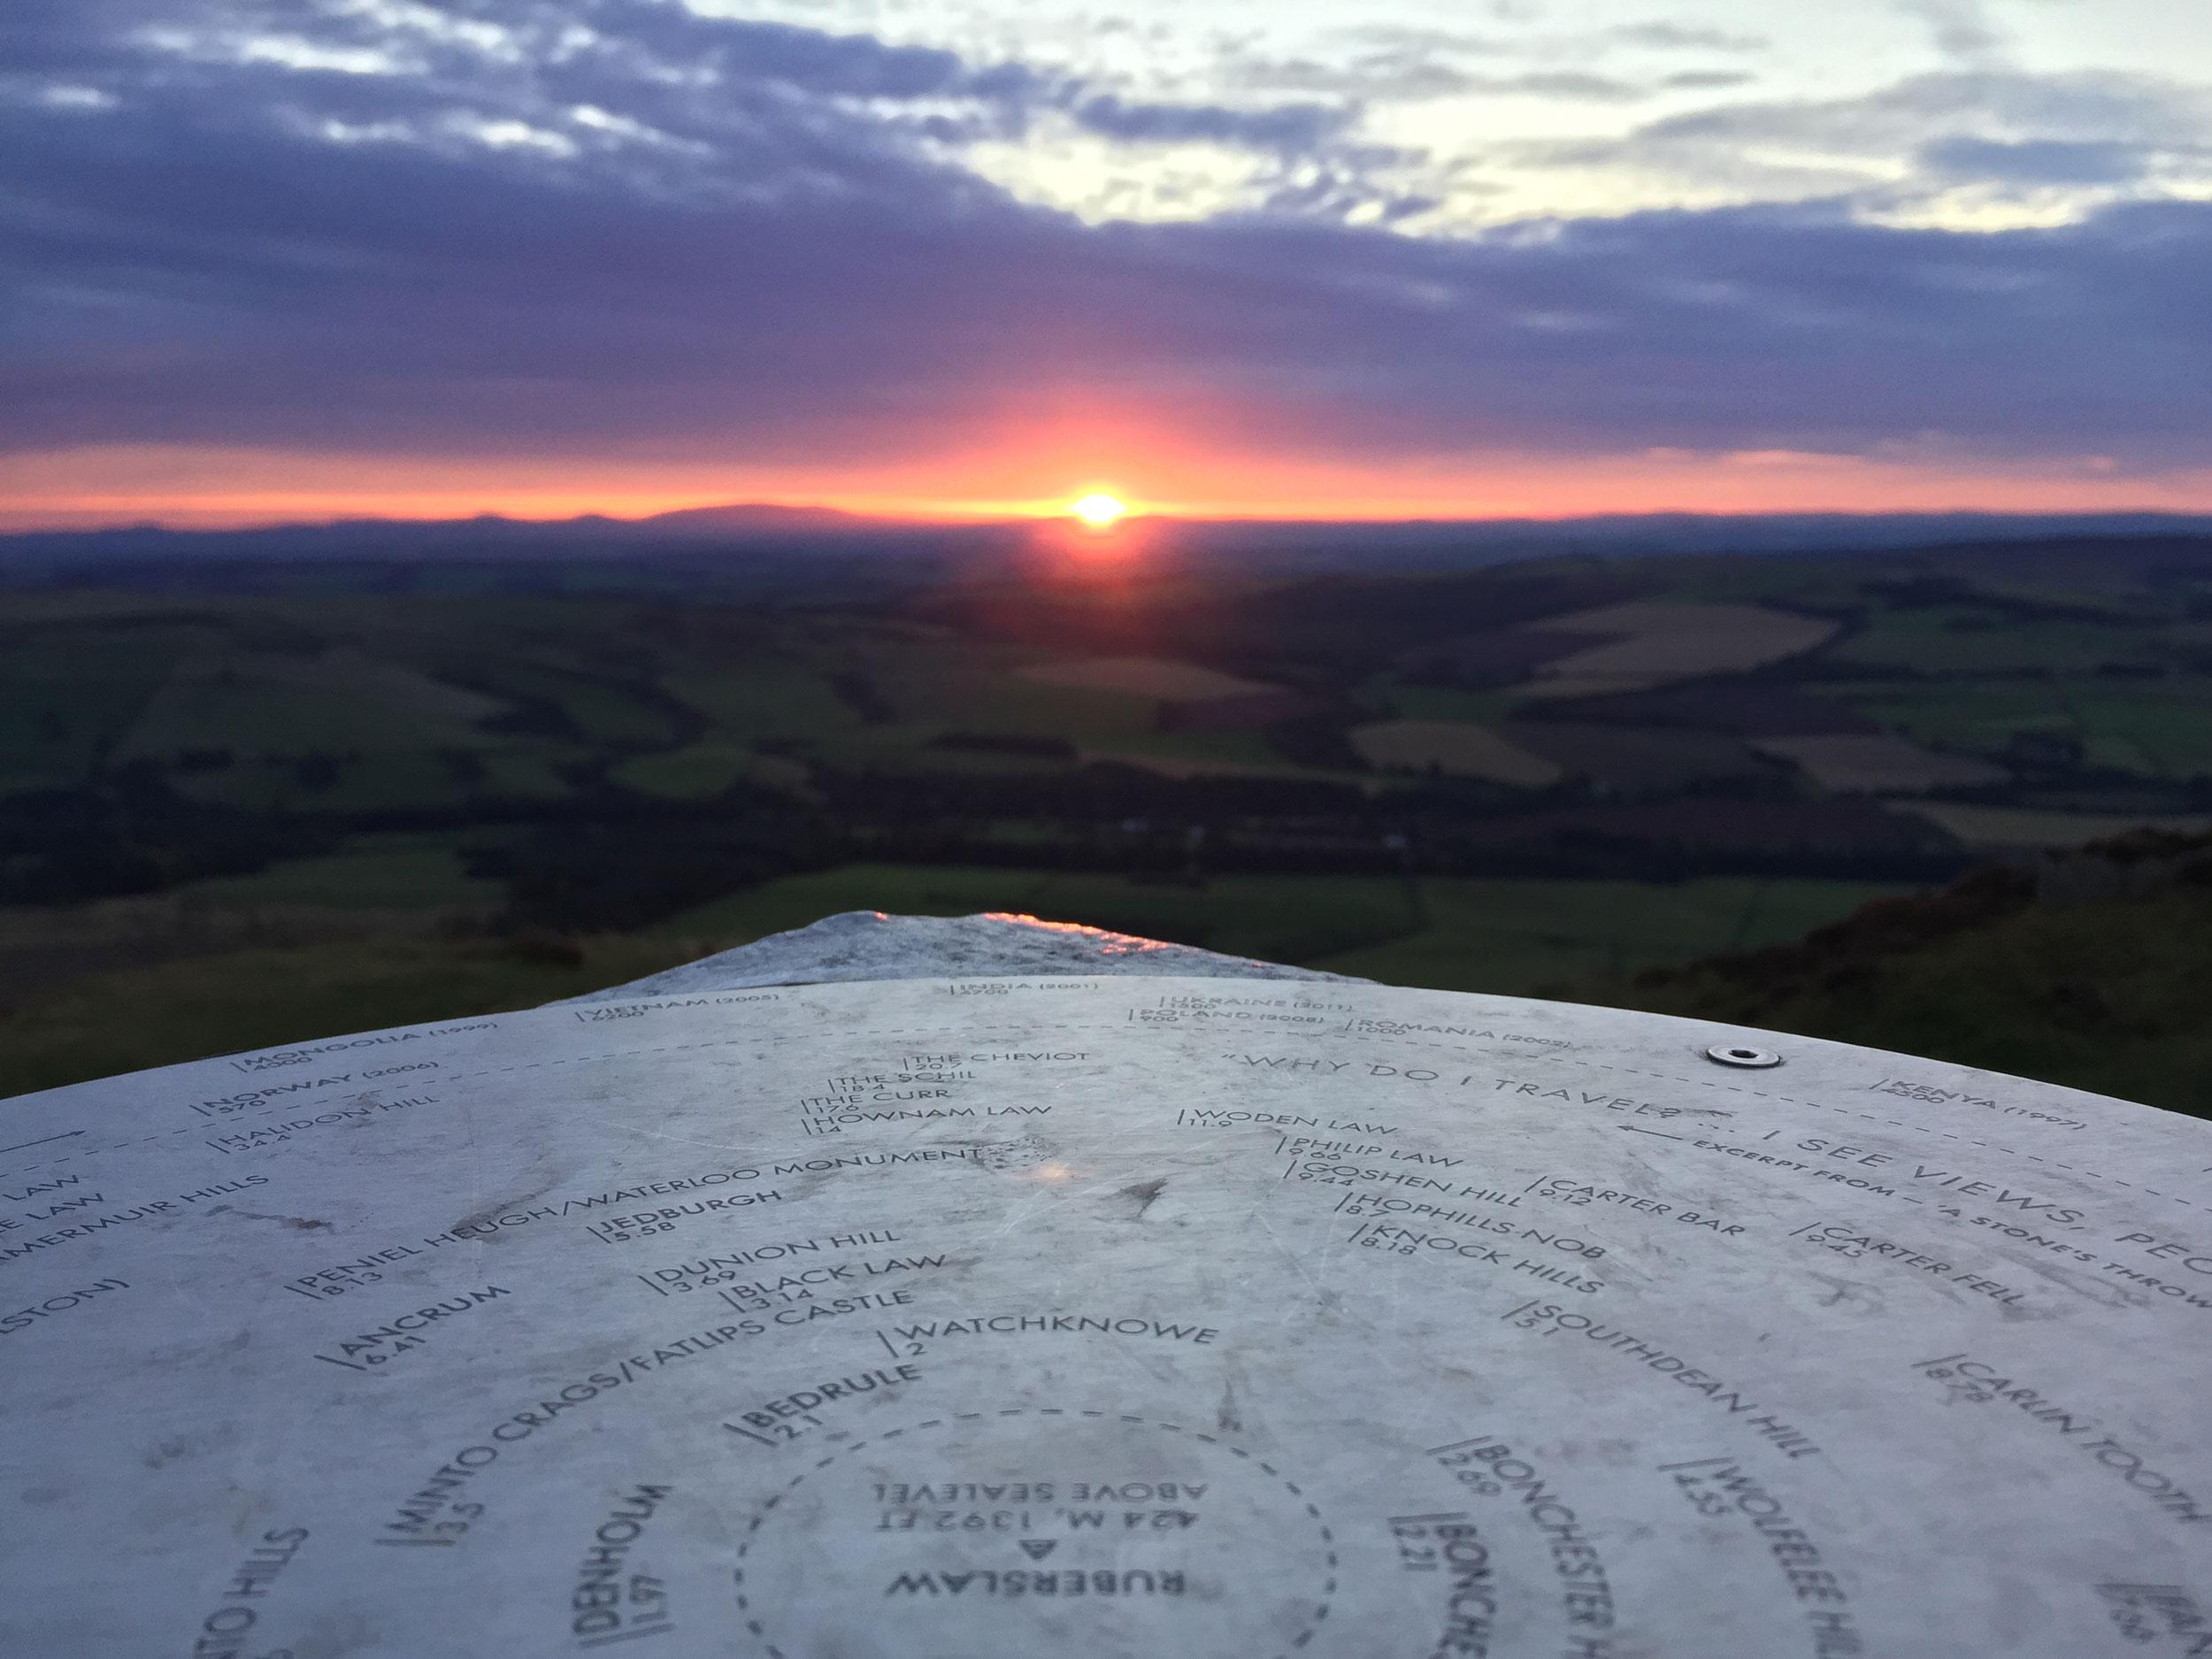 Sunrise from Ruberslaw, Scottish Borders  (Humphrey Butler/Marvellous Maps)